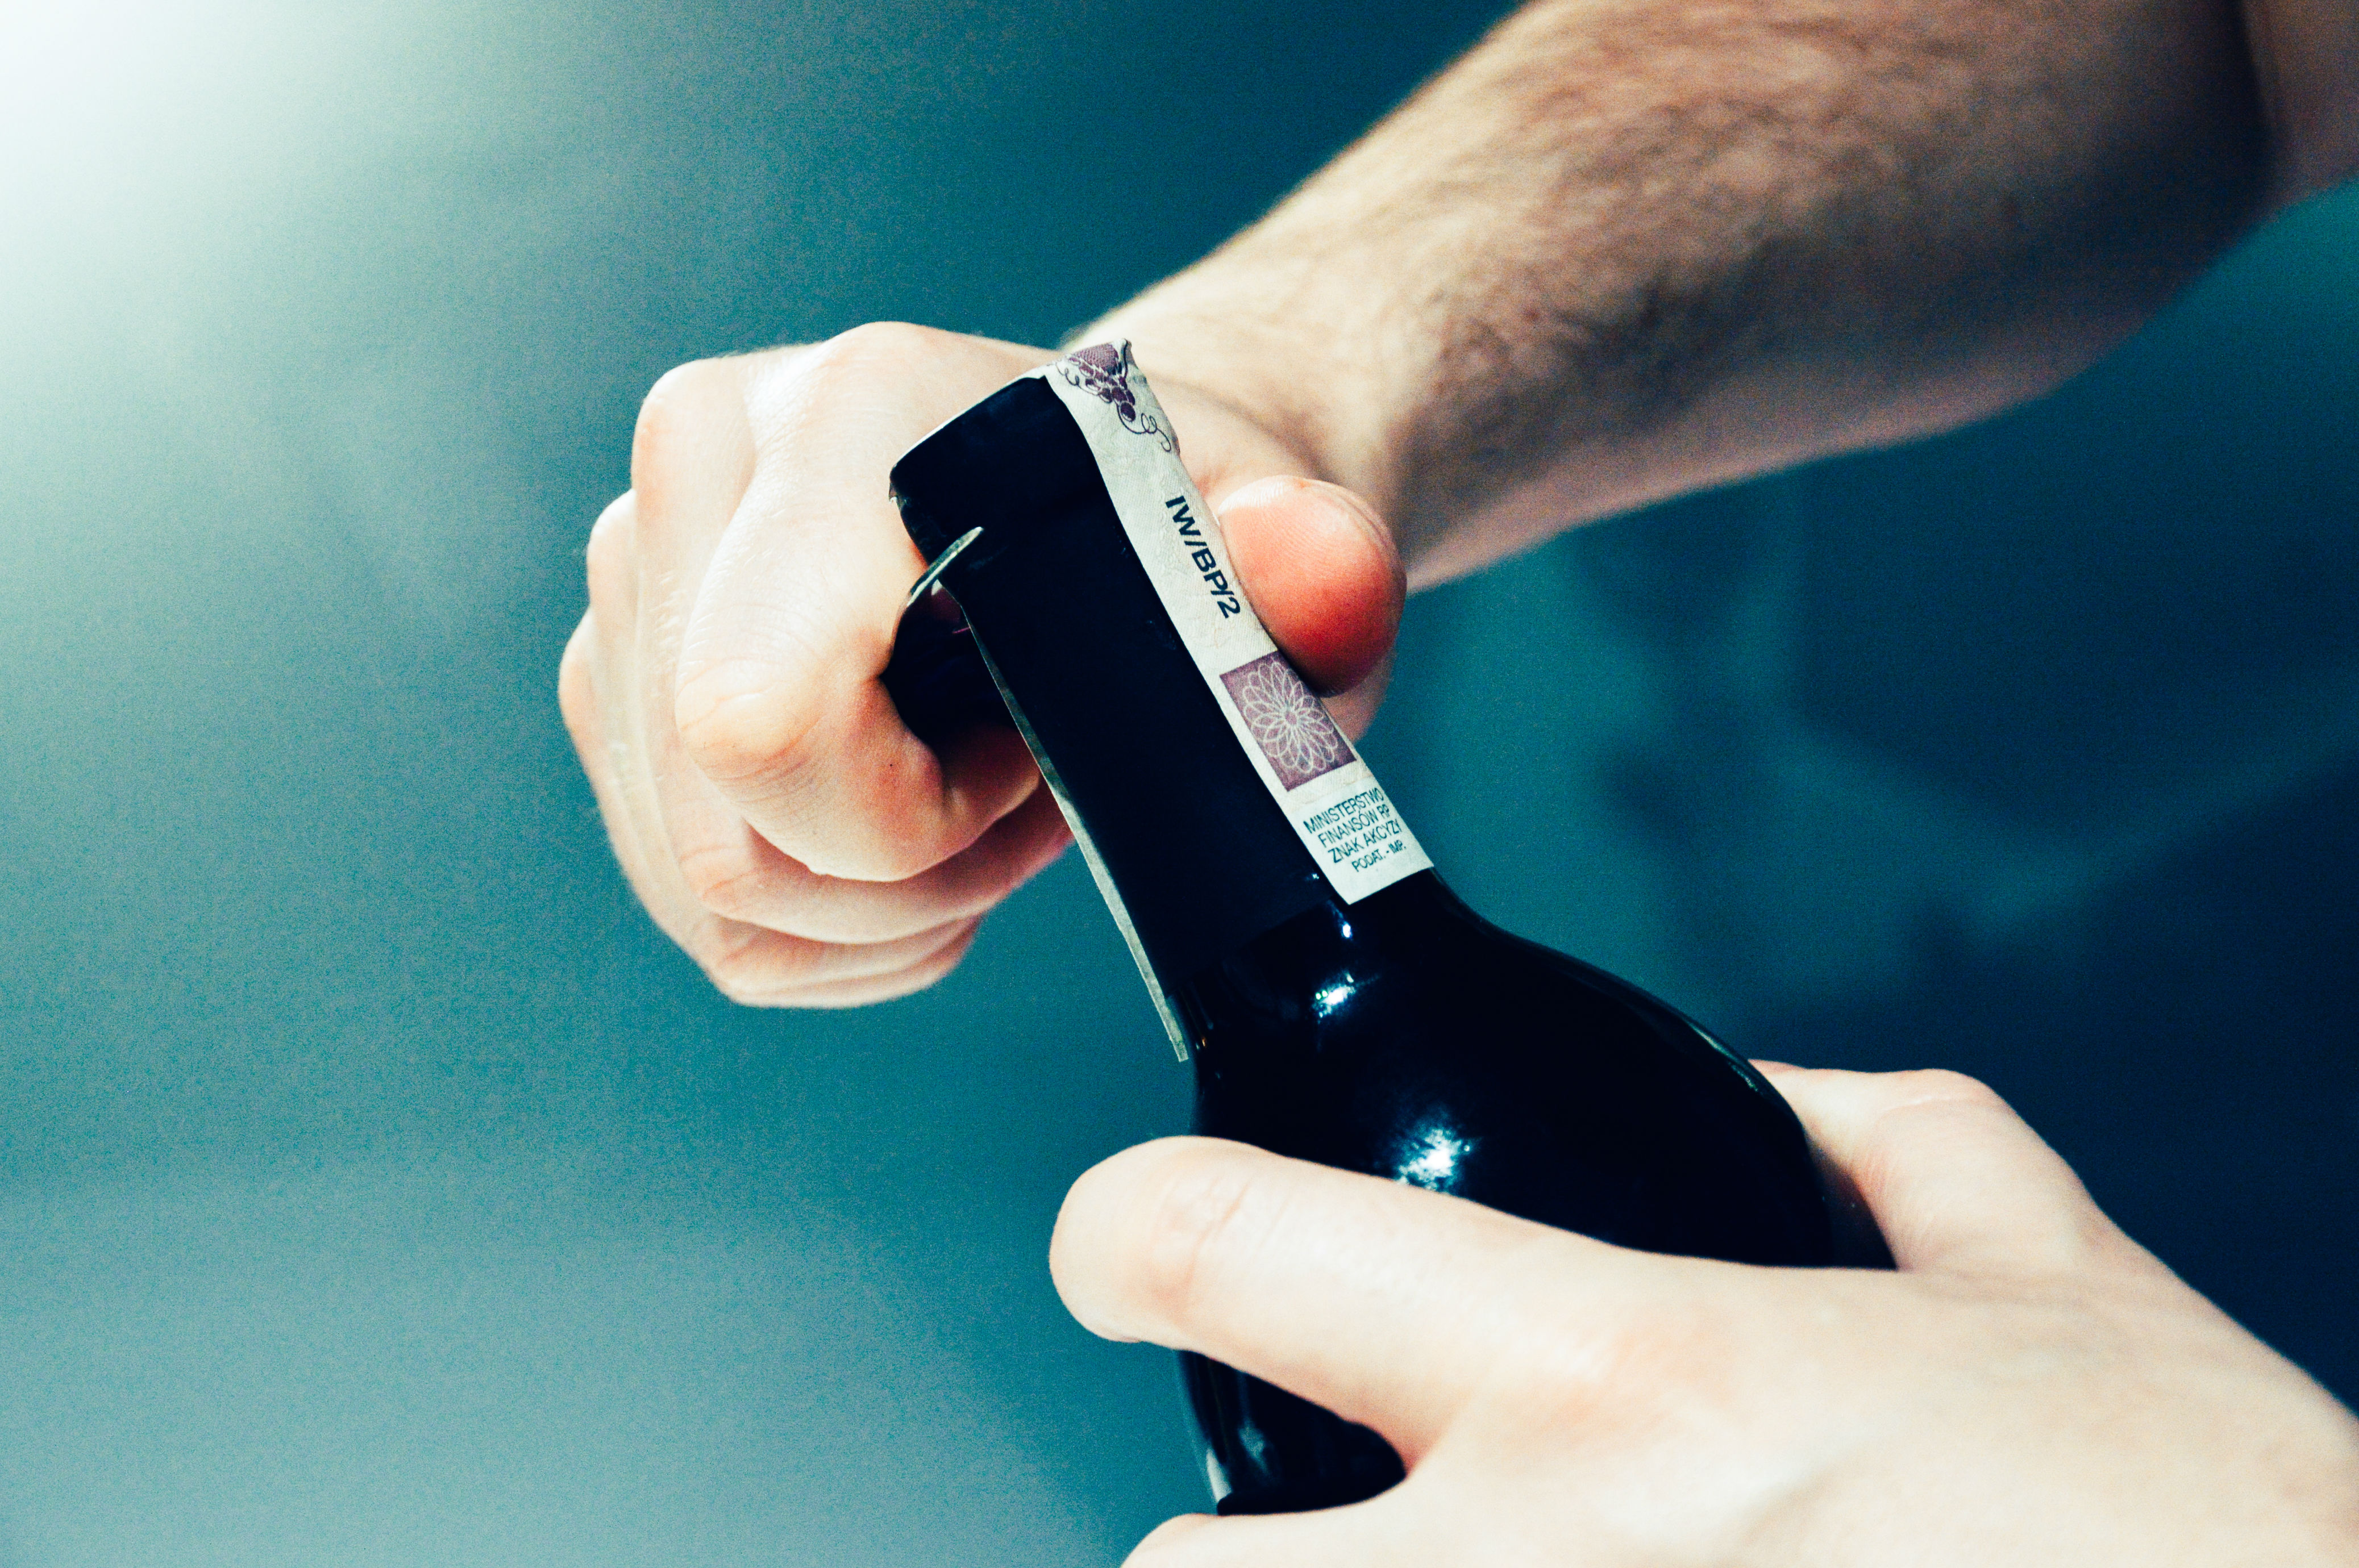 botella-vino-abridor-mano